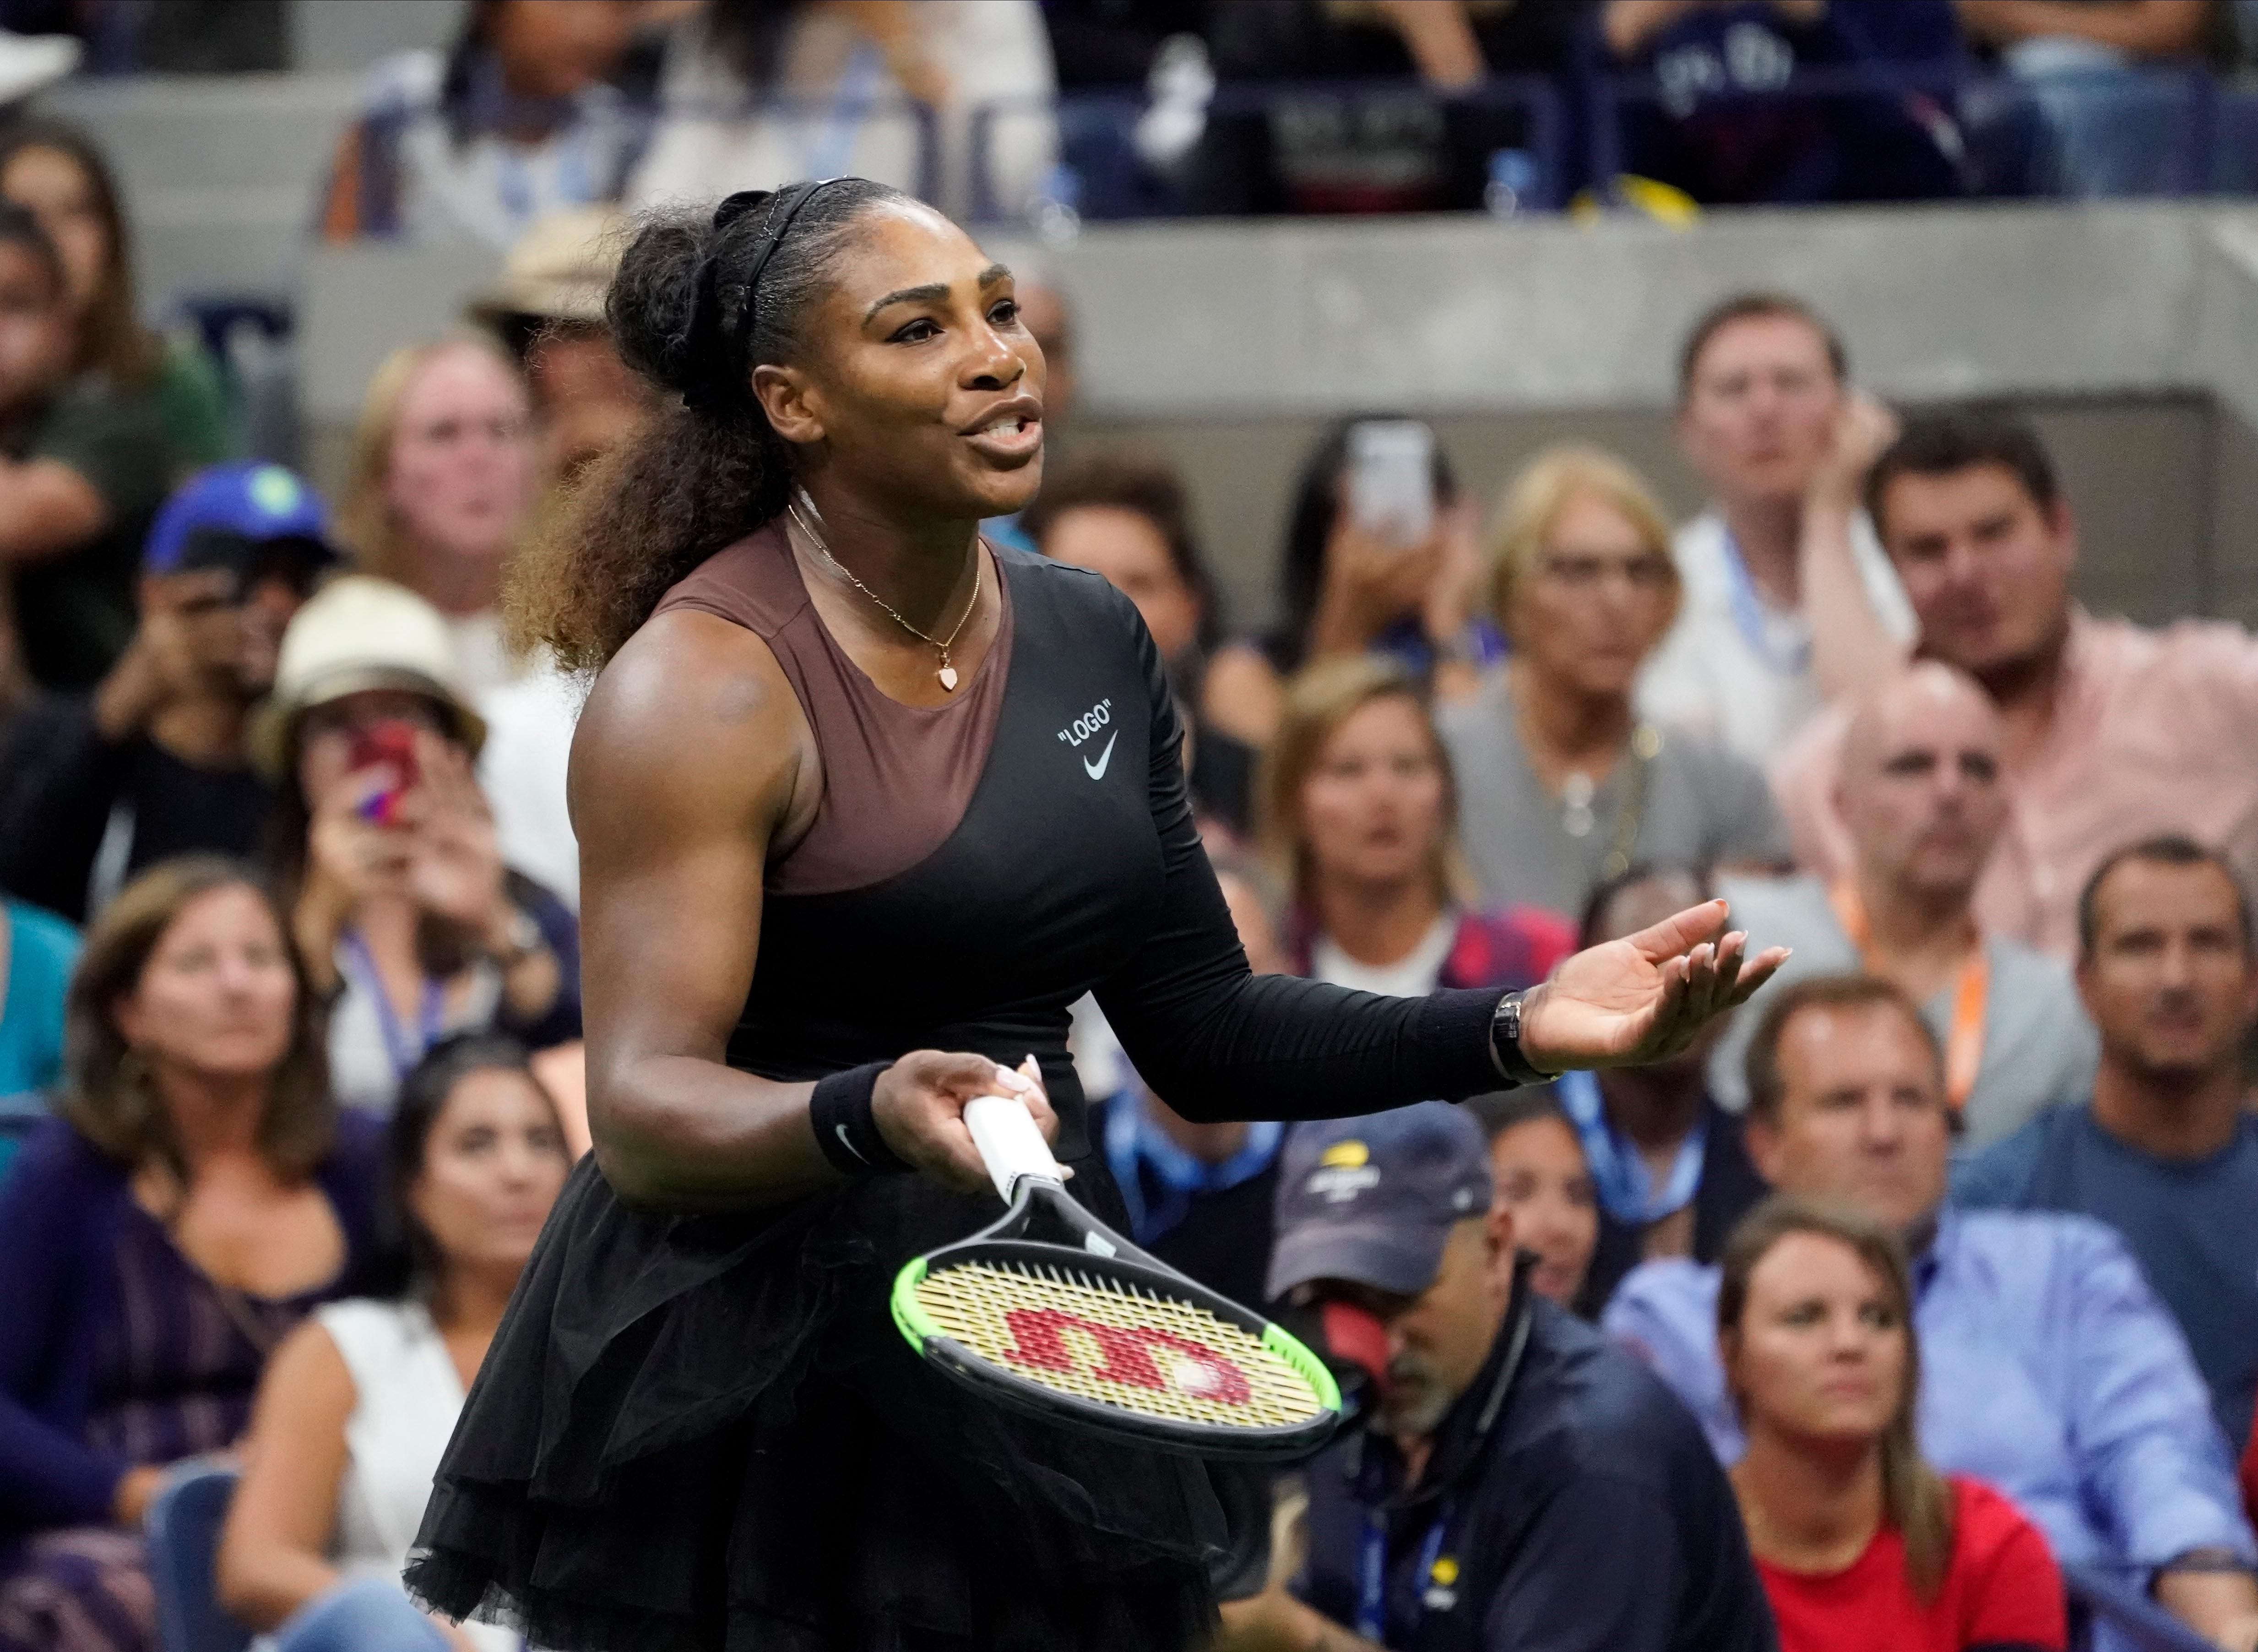 Novak Djokovic Umpire Should Not Have Pushed Serena Williams In Us Open Final News Heraldmailmedia Com